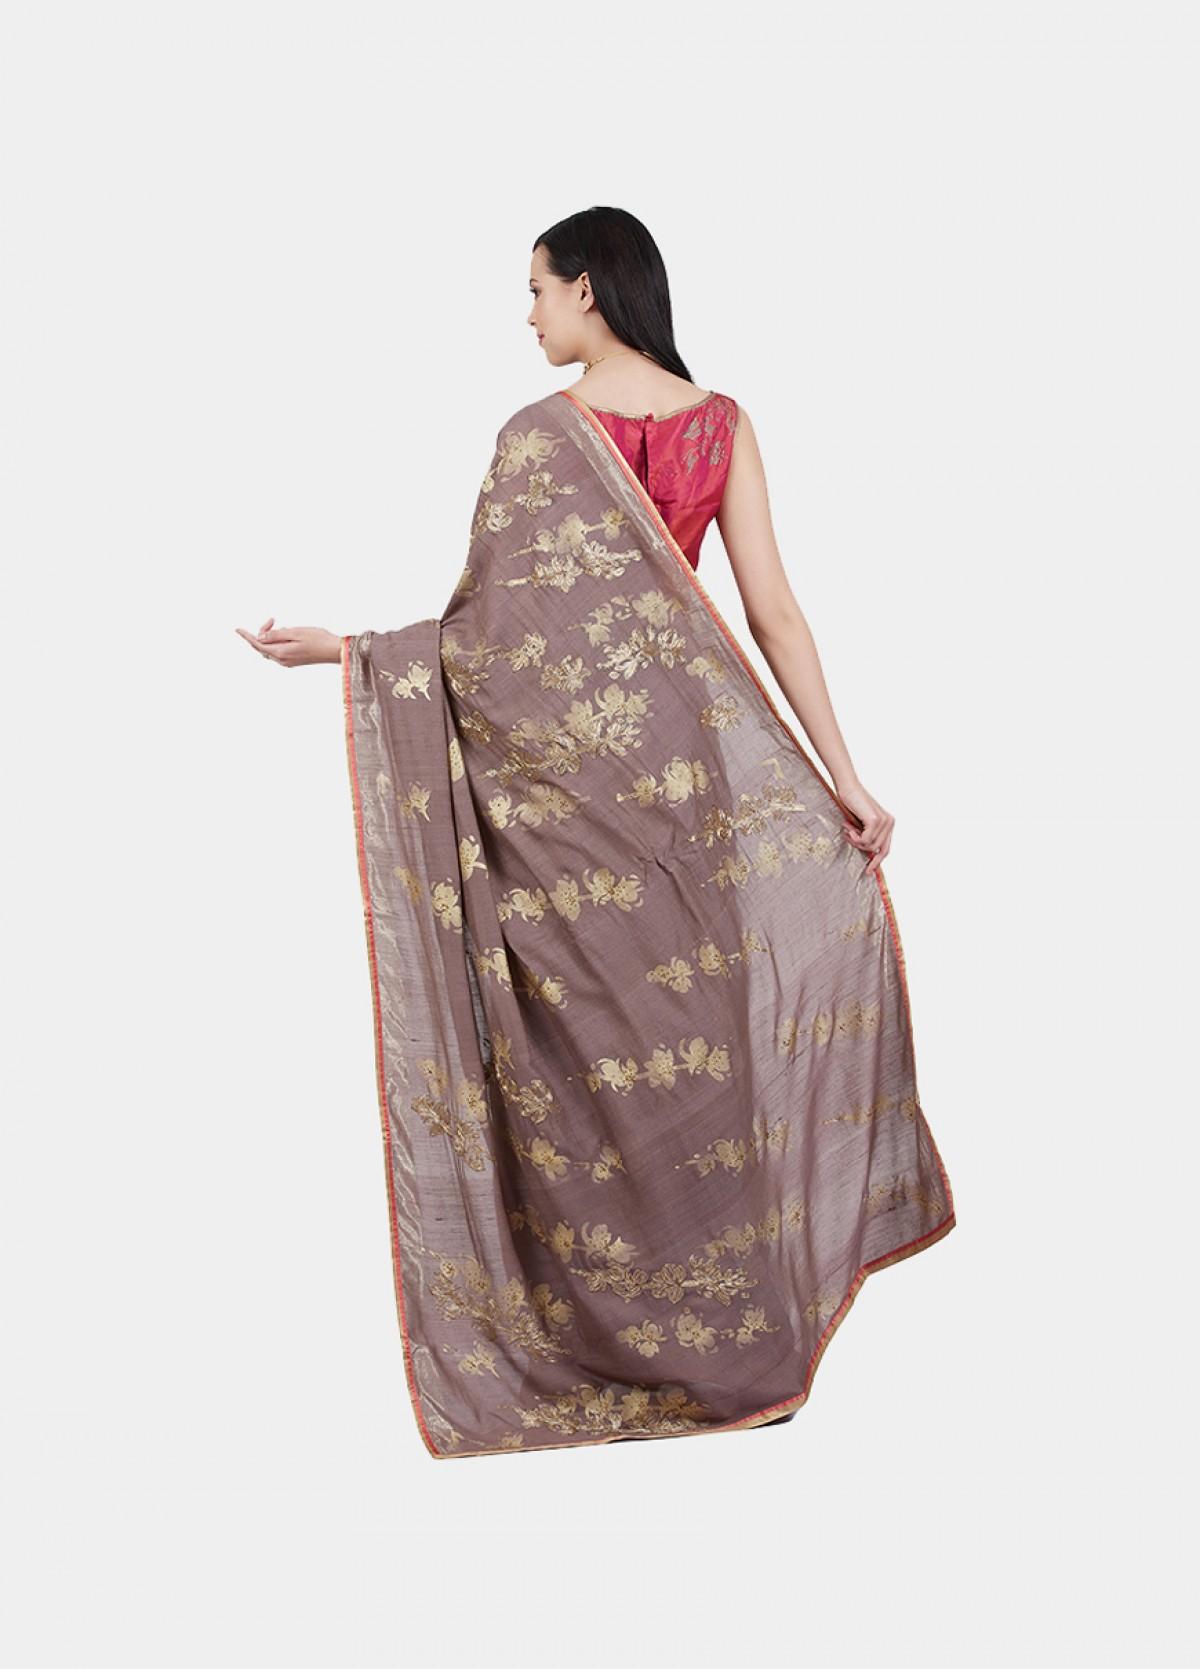 The Mogra Ray Sari